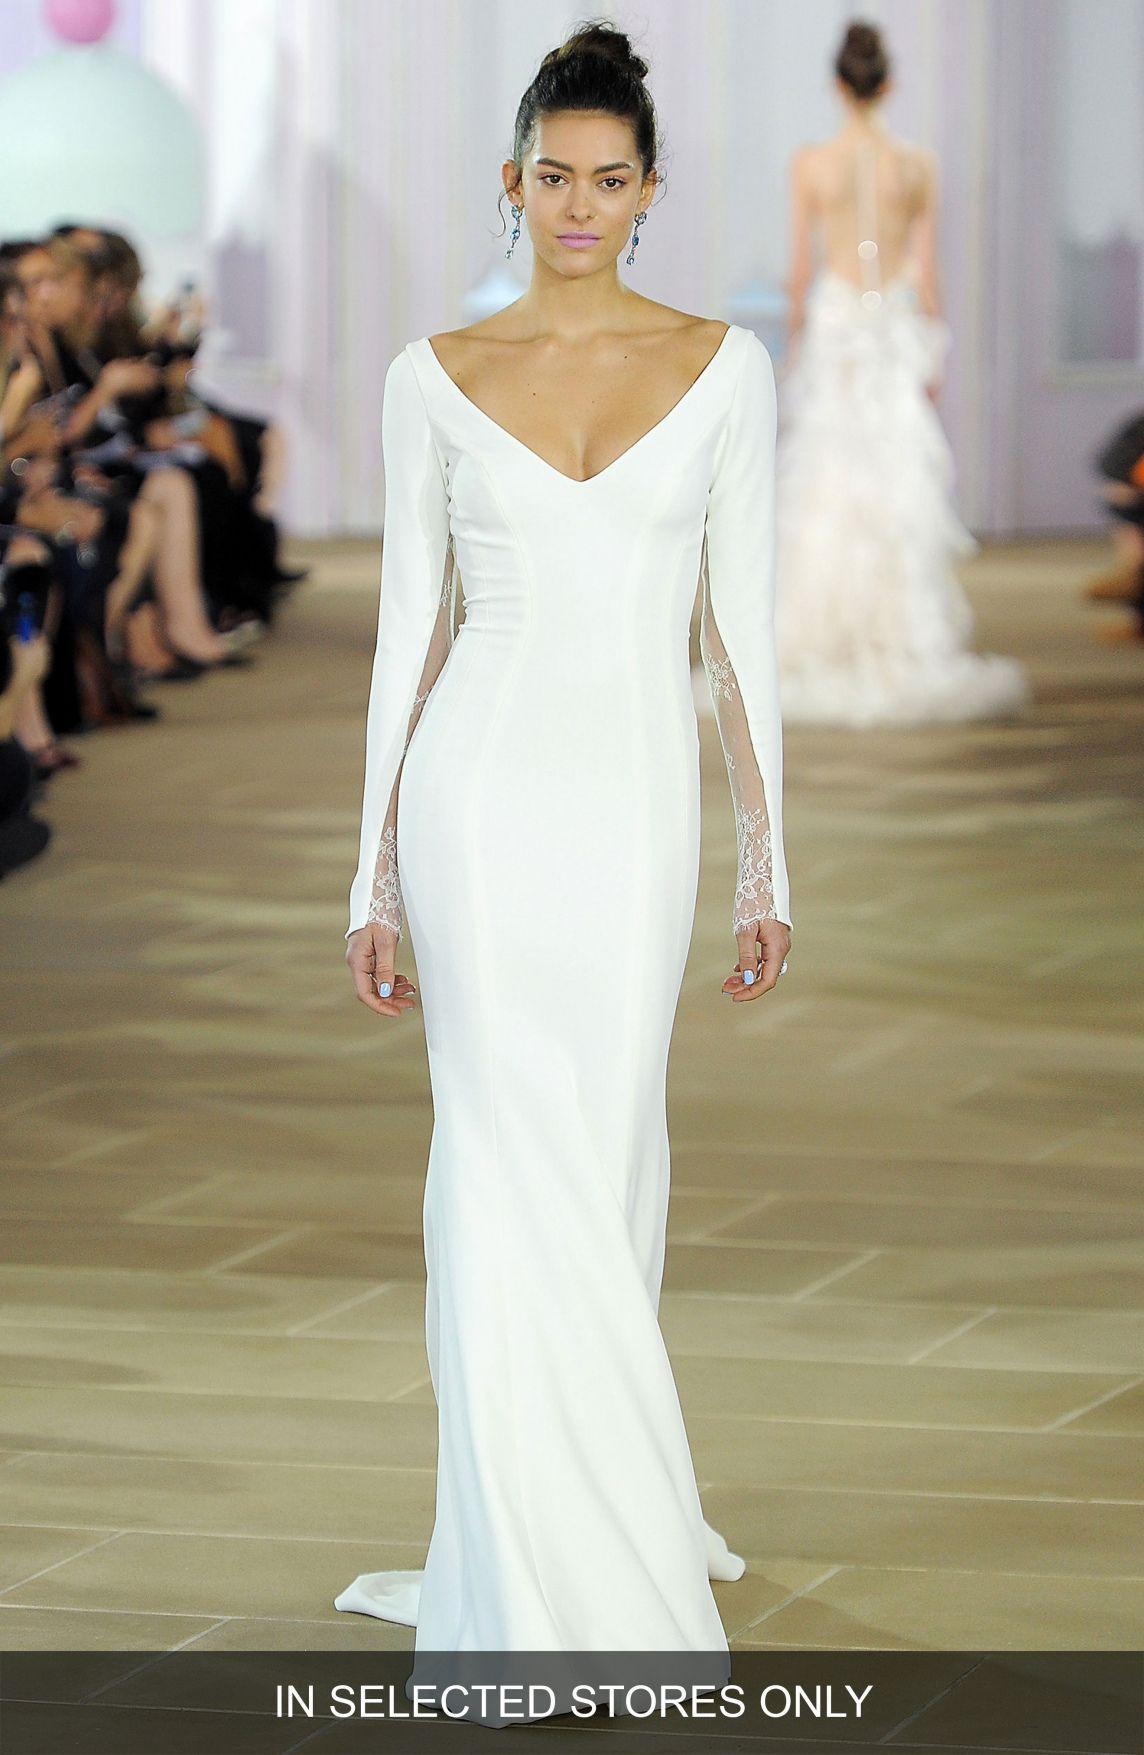 plain white satin wedding dress dresses for wedding party